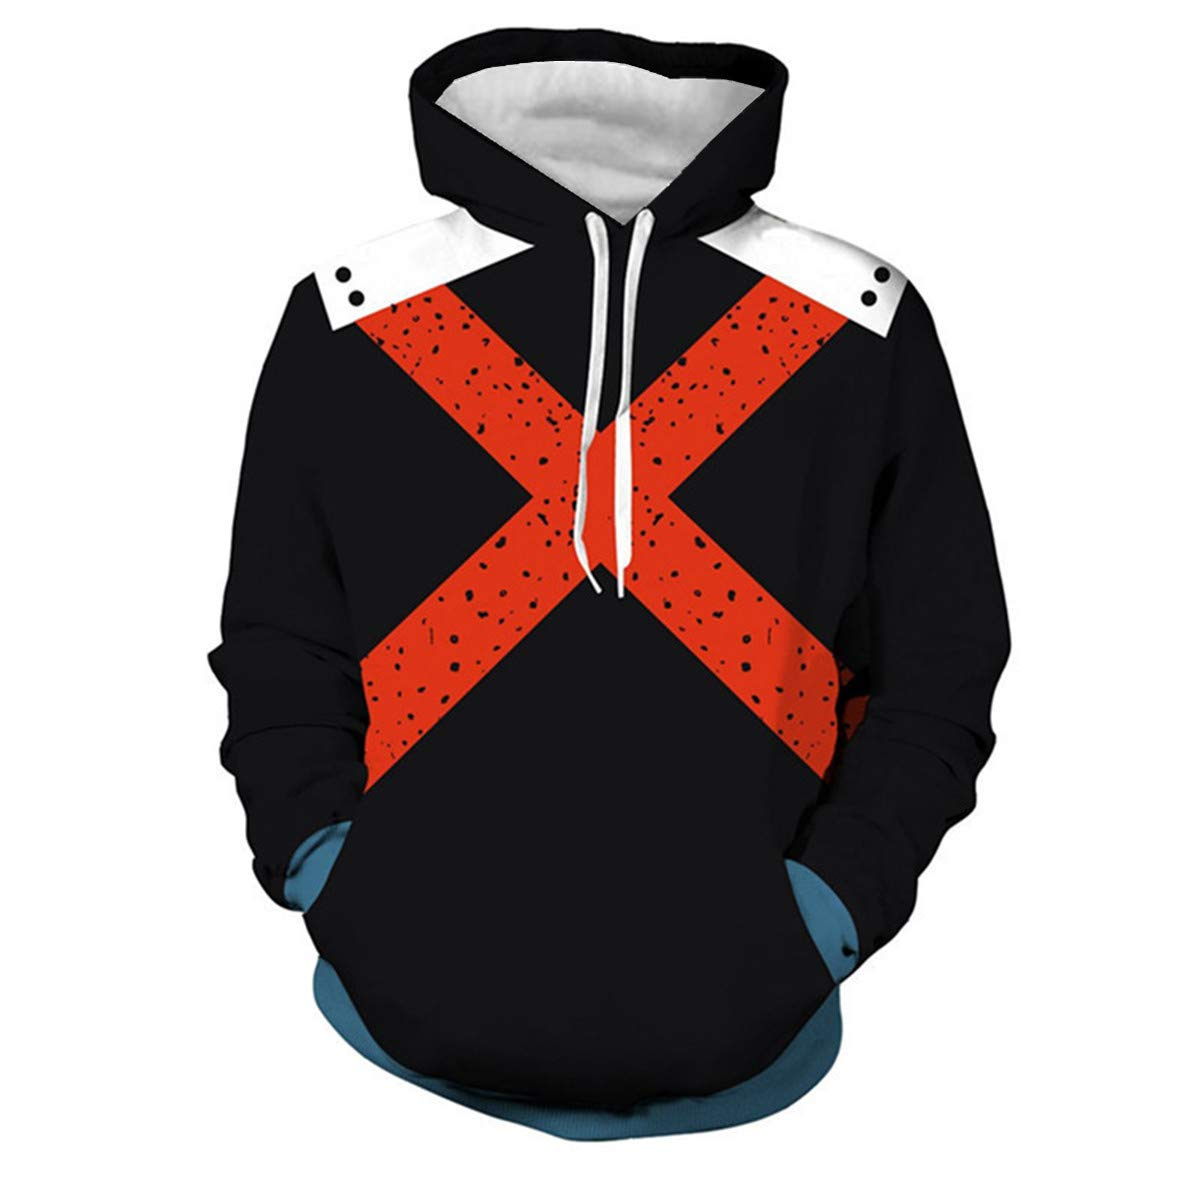 CHENMA Men My Hero Academia 3D Print Pullover Hoodie Sweatshirt with Kangaroo Pocket